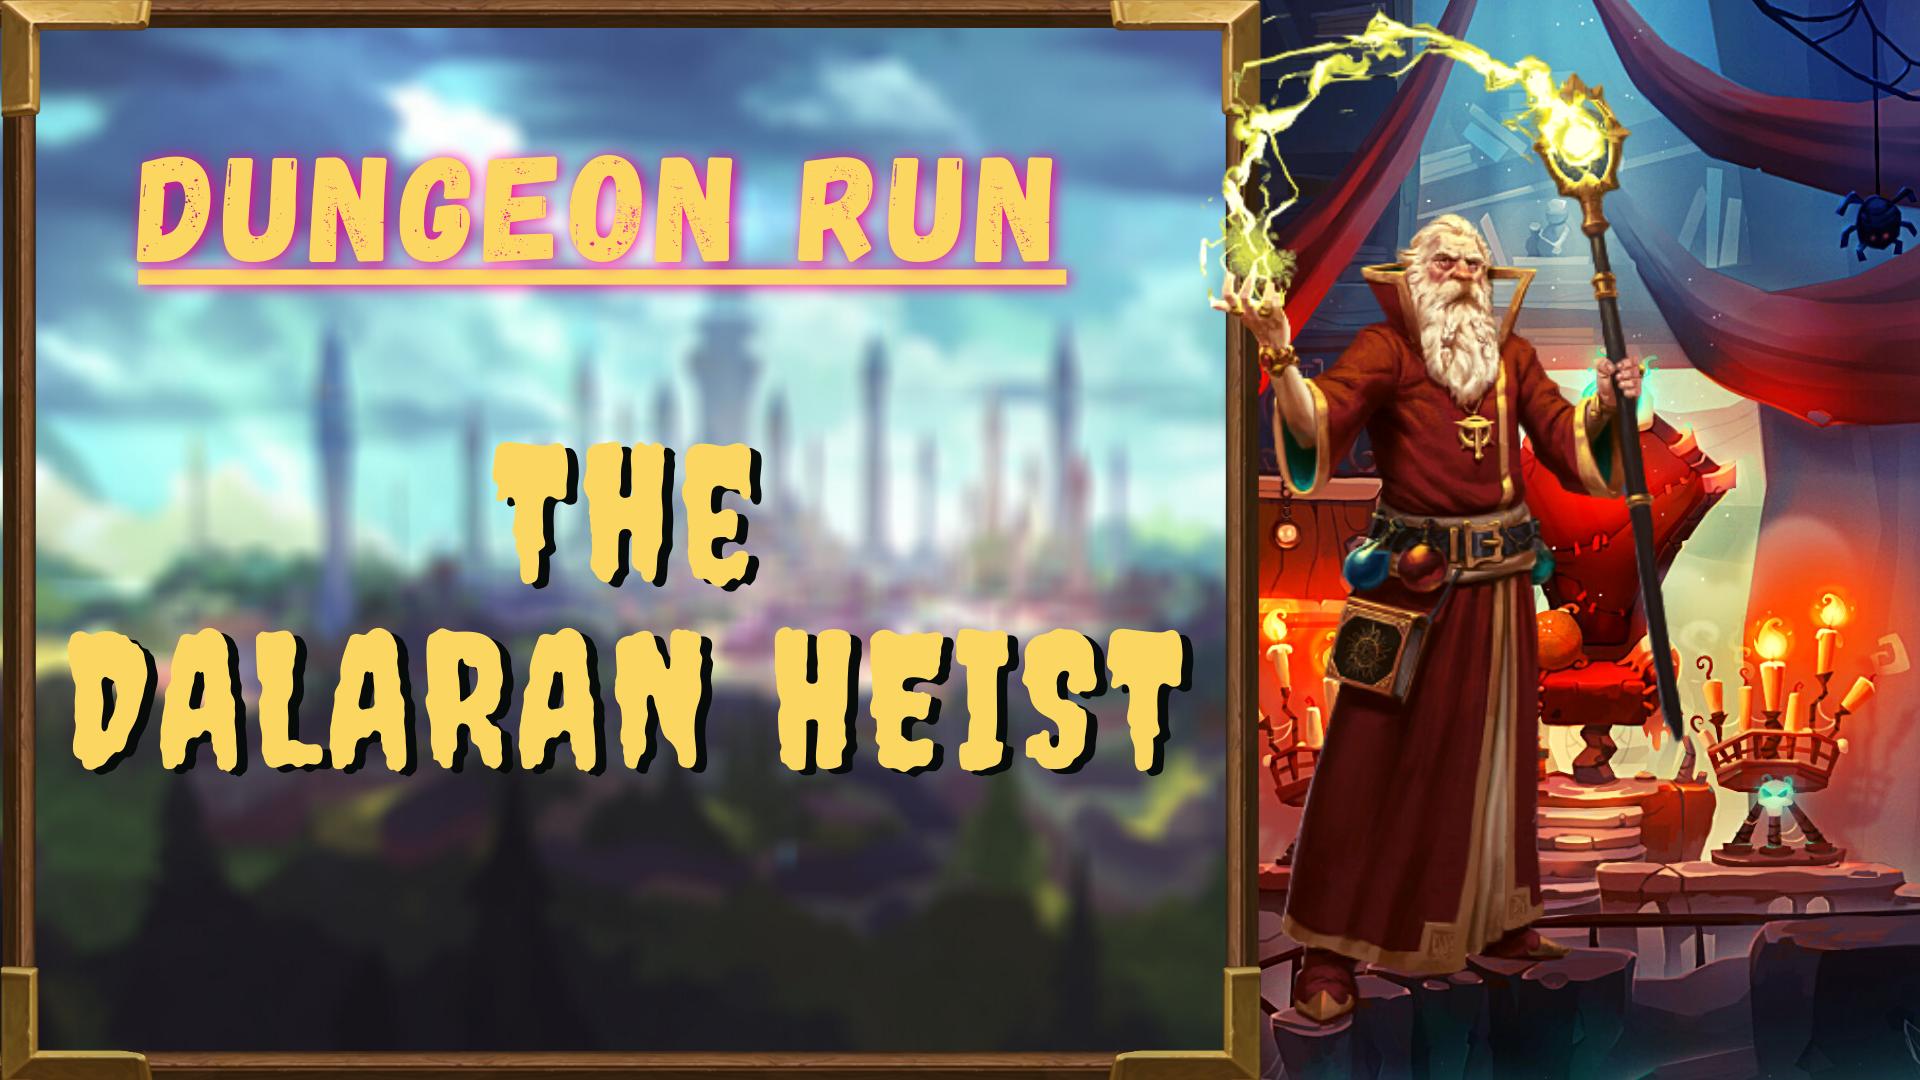 Dungeon run: The Dalaran Heist GBD - e2p.com